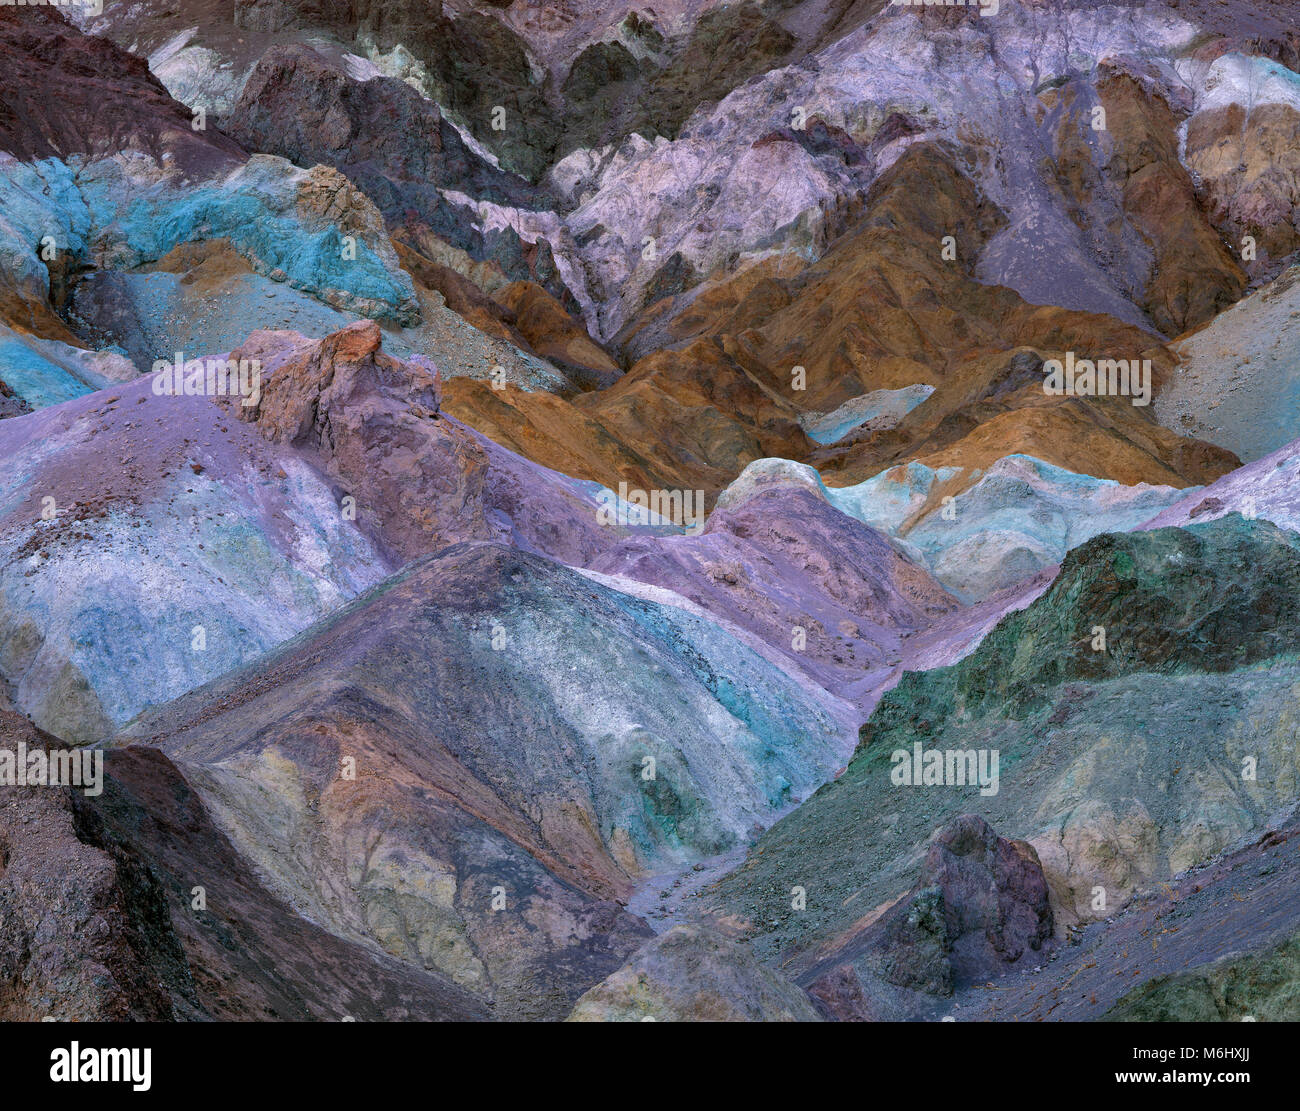 Artist's Palette, Death Valley National Park, California - Stock Image